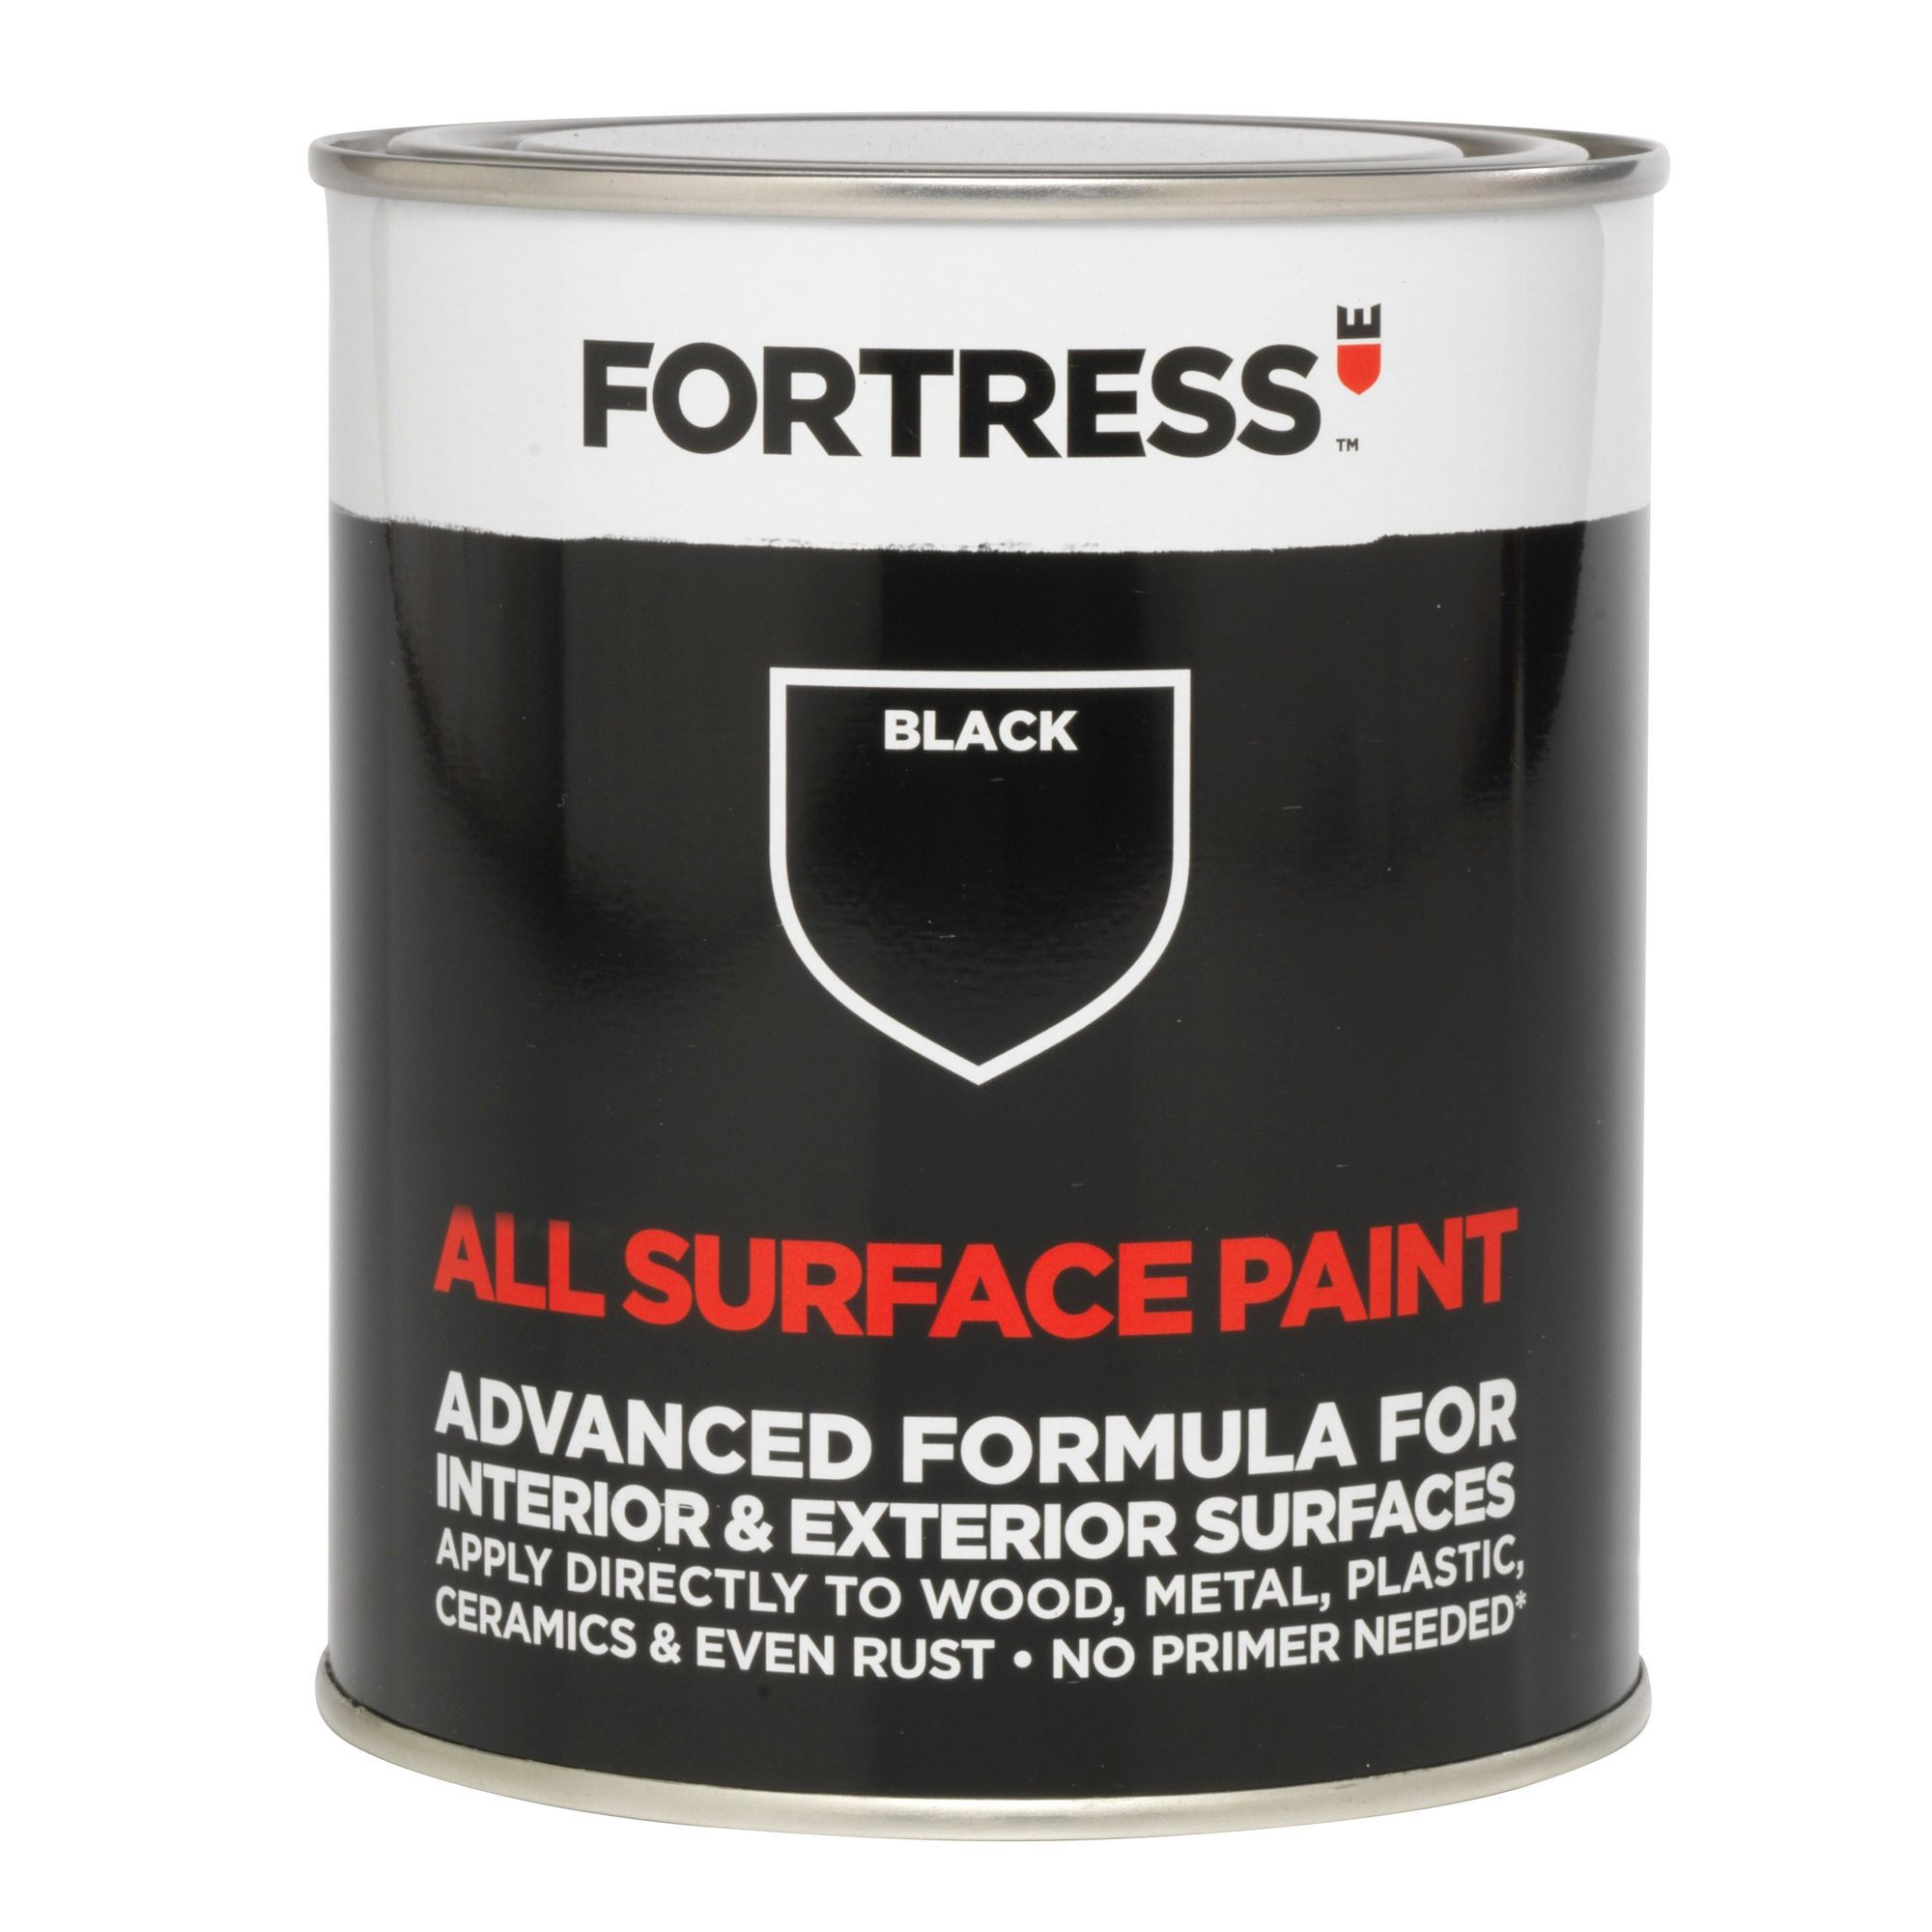 Fortress Interior Exterior Black Matt Multipurpose Paint 250ml Departments Diy At B Q